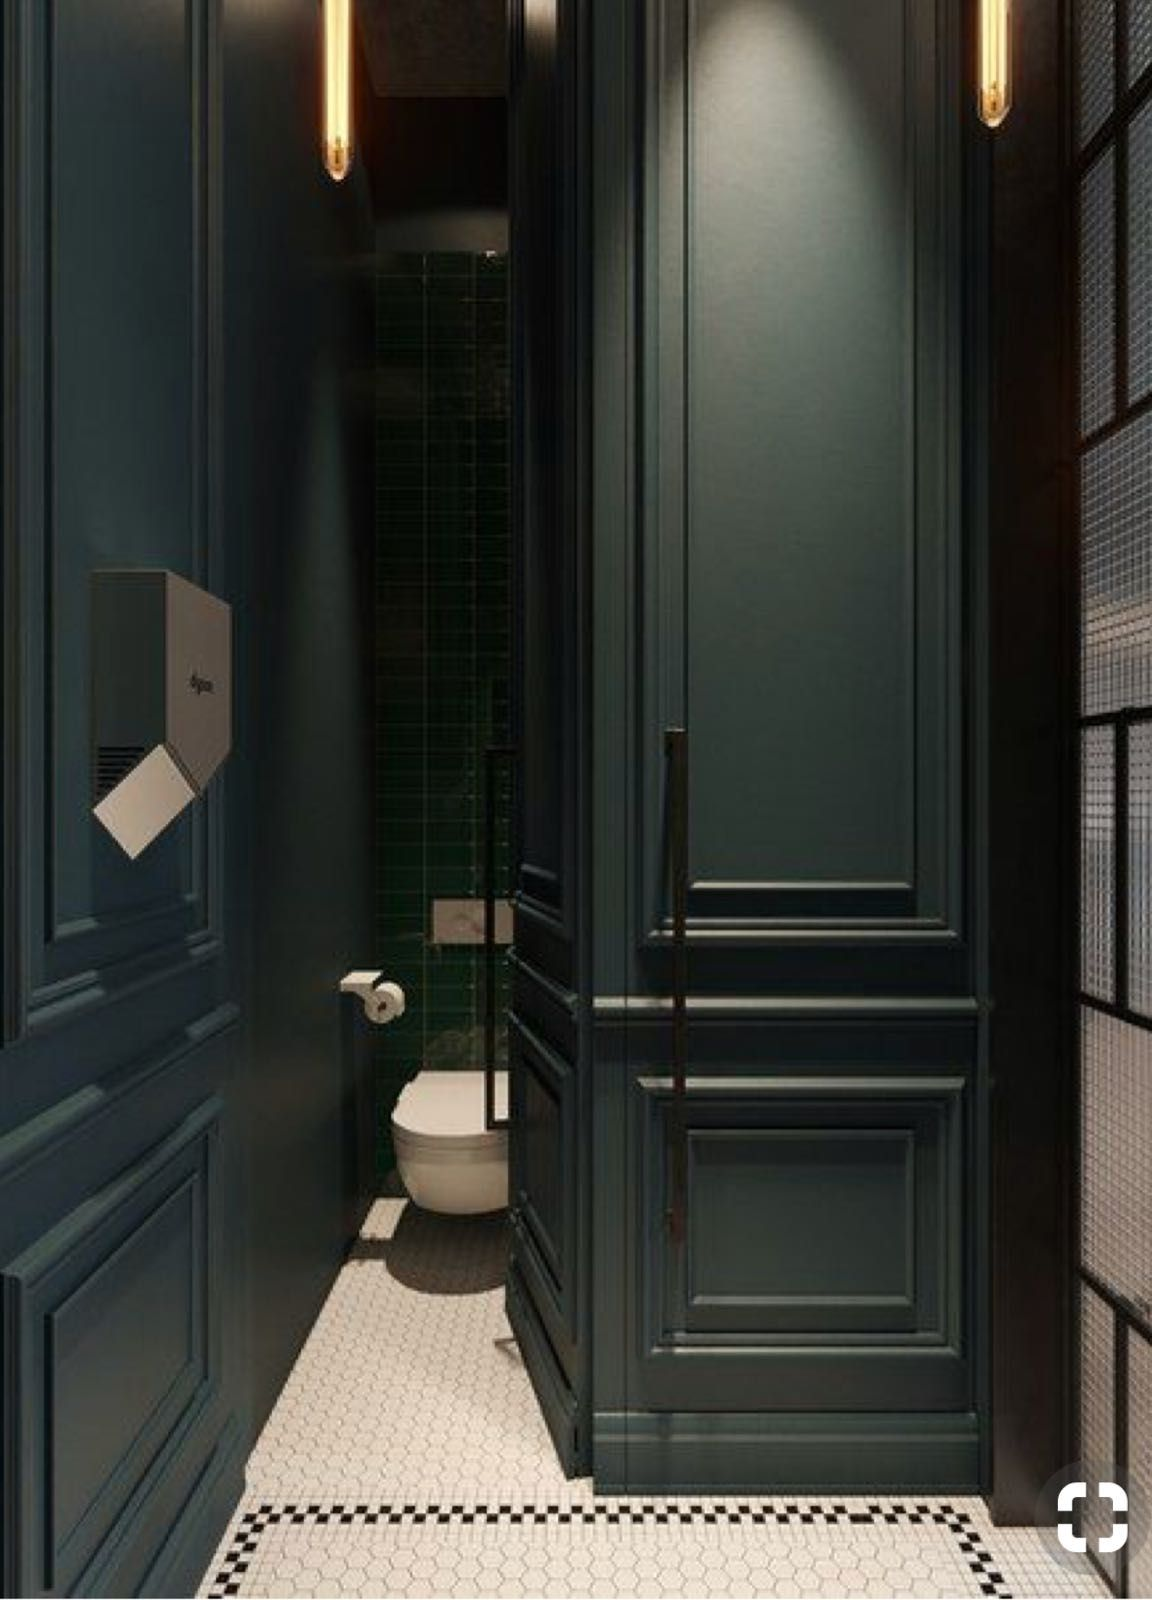 Pin By Sharon Corona On Bar Modern Powder Rooms Powder Room Design Green Bathroom